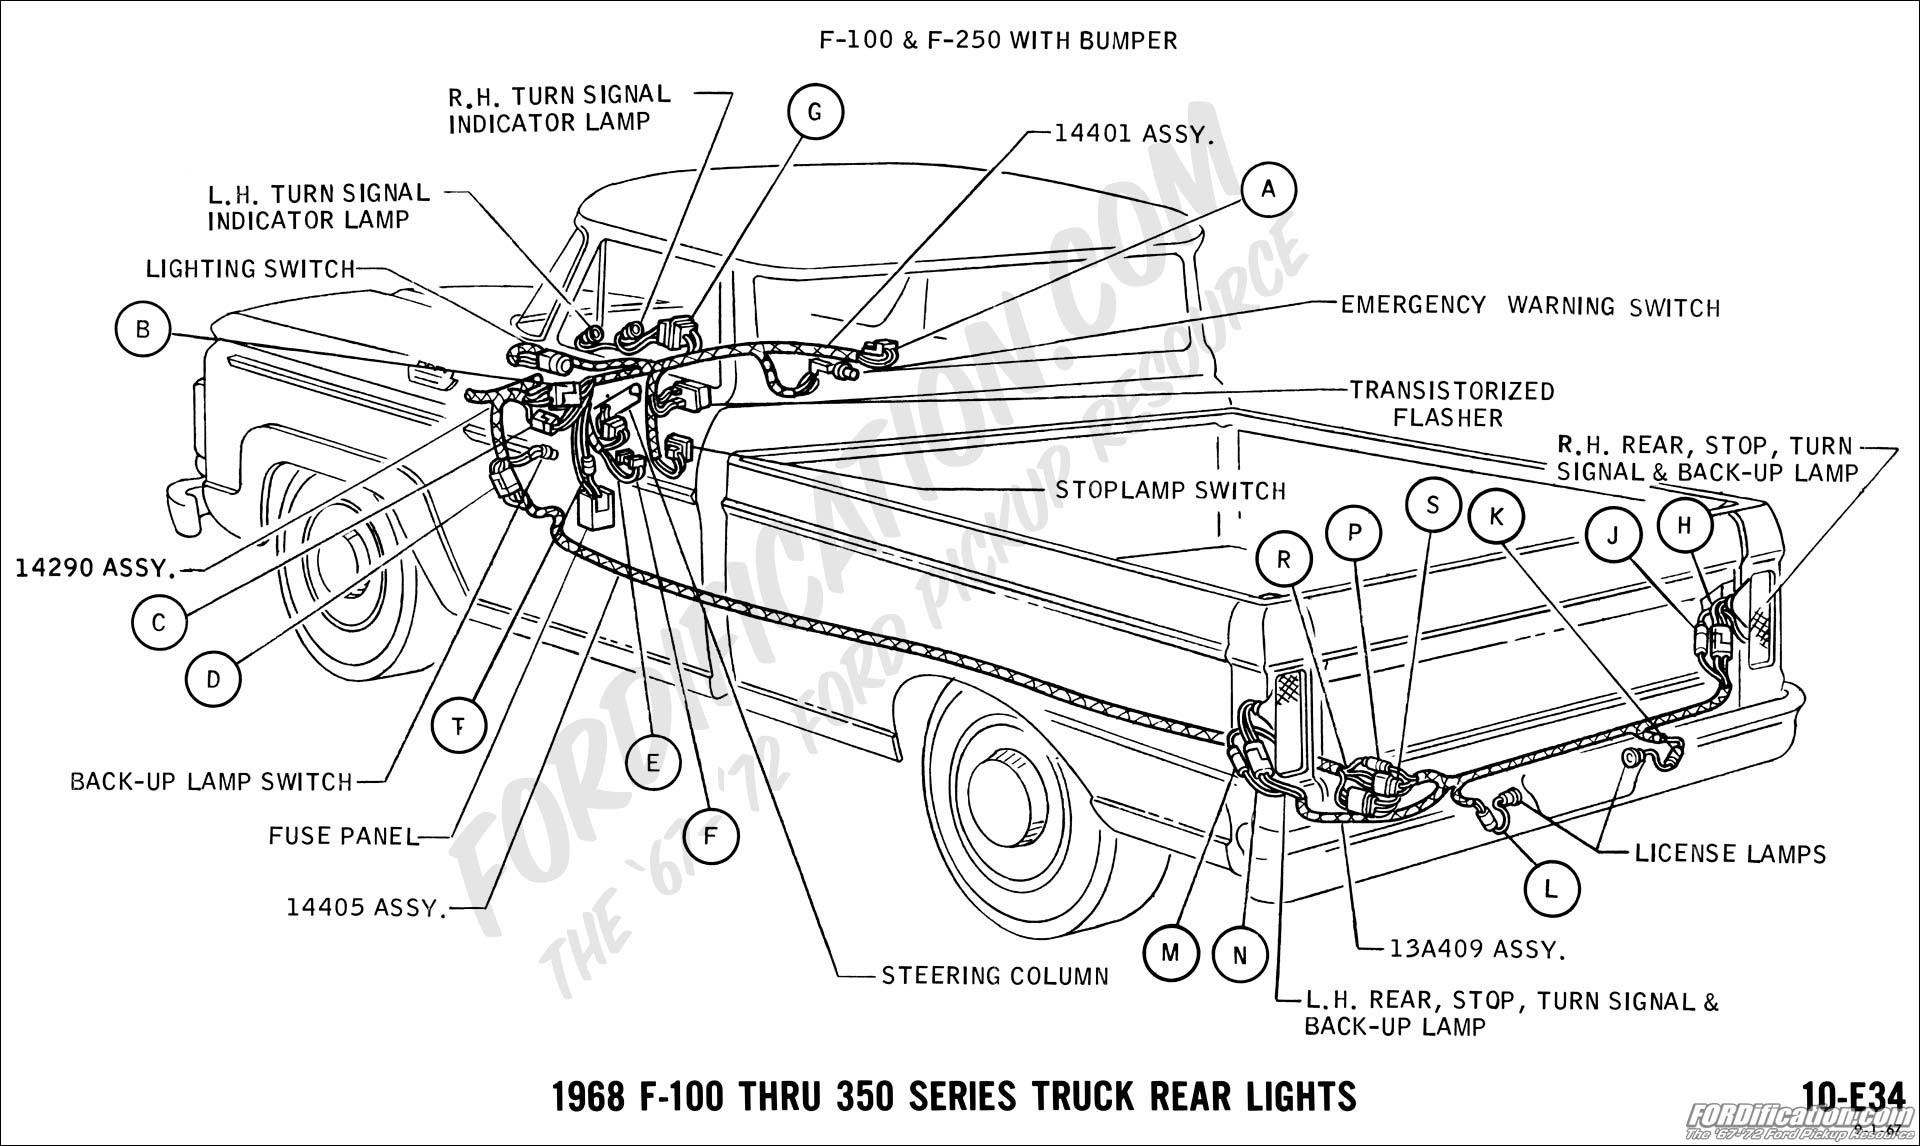 1996 toyota Tacoma Parts Diagram 4r100 Transmission Valve